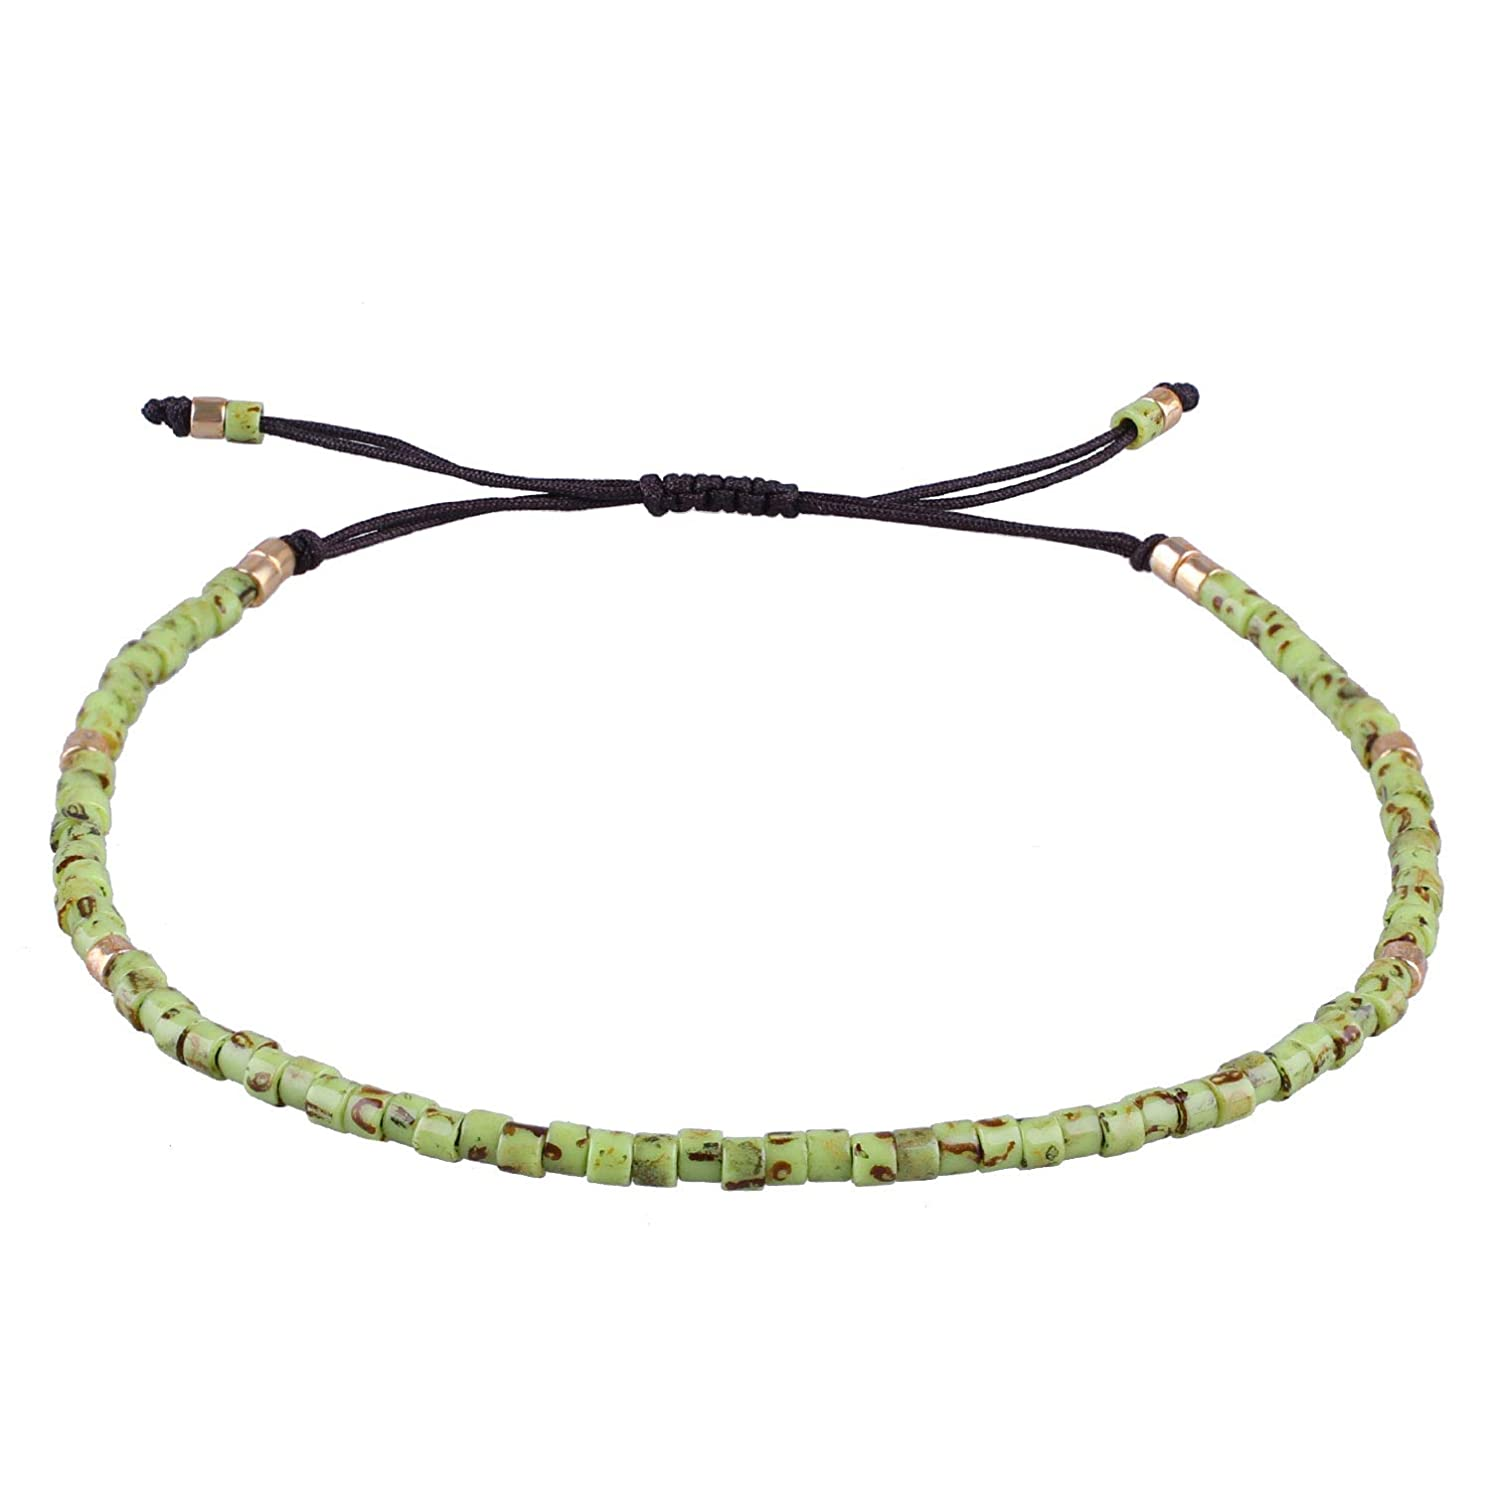 KELITCH Seed Bead Friendship Strand Bracelet Handmade Beaded String Bracelet Fashion Charm Jewelry